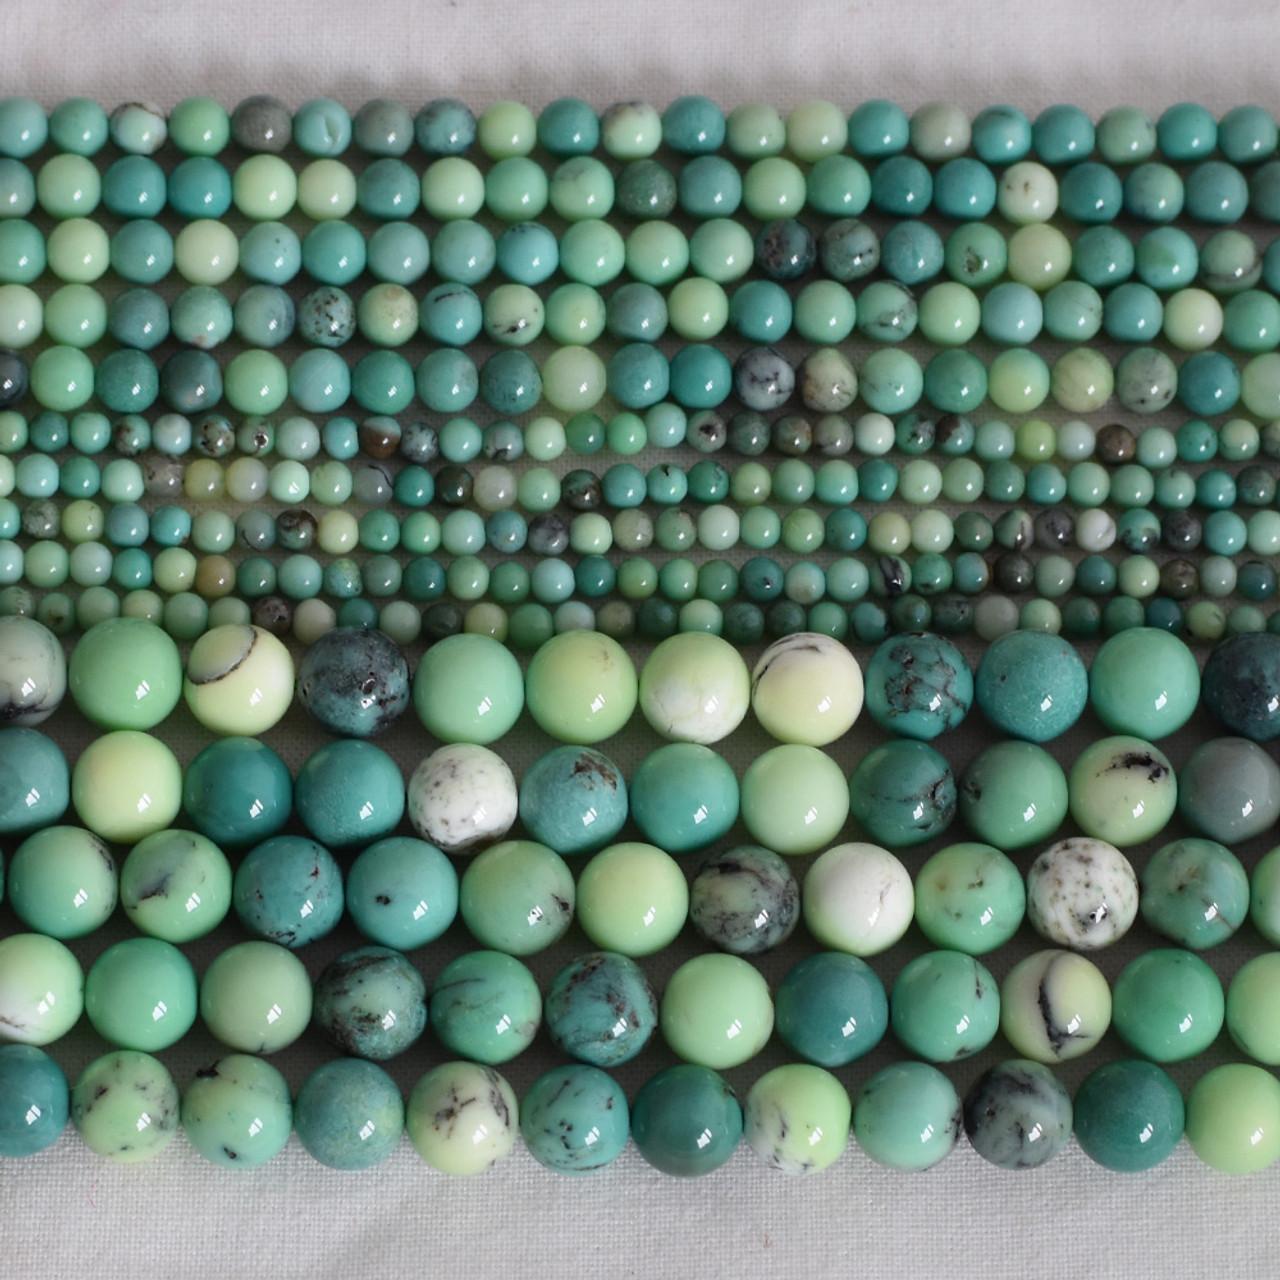 Grade A Natural Grey Opal Semi-precious Gemstone Round Beads 6mm 8mm 10mm